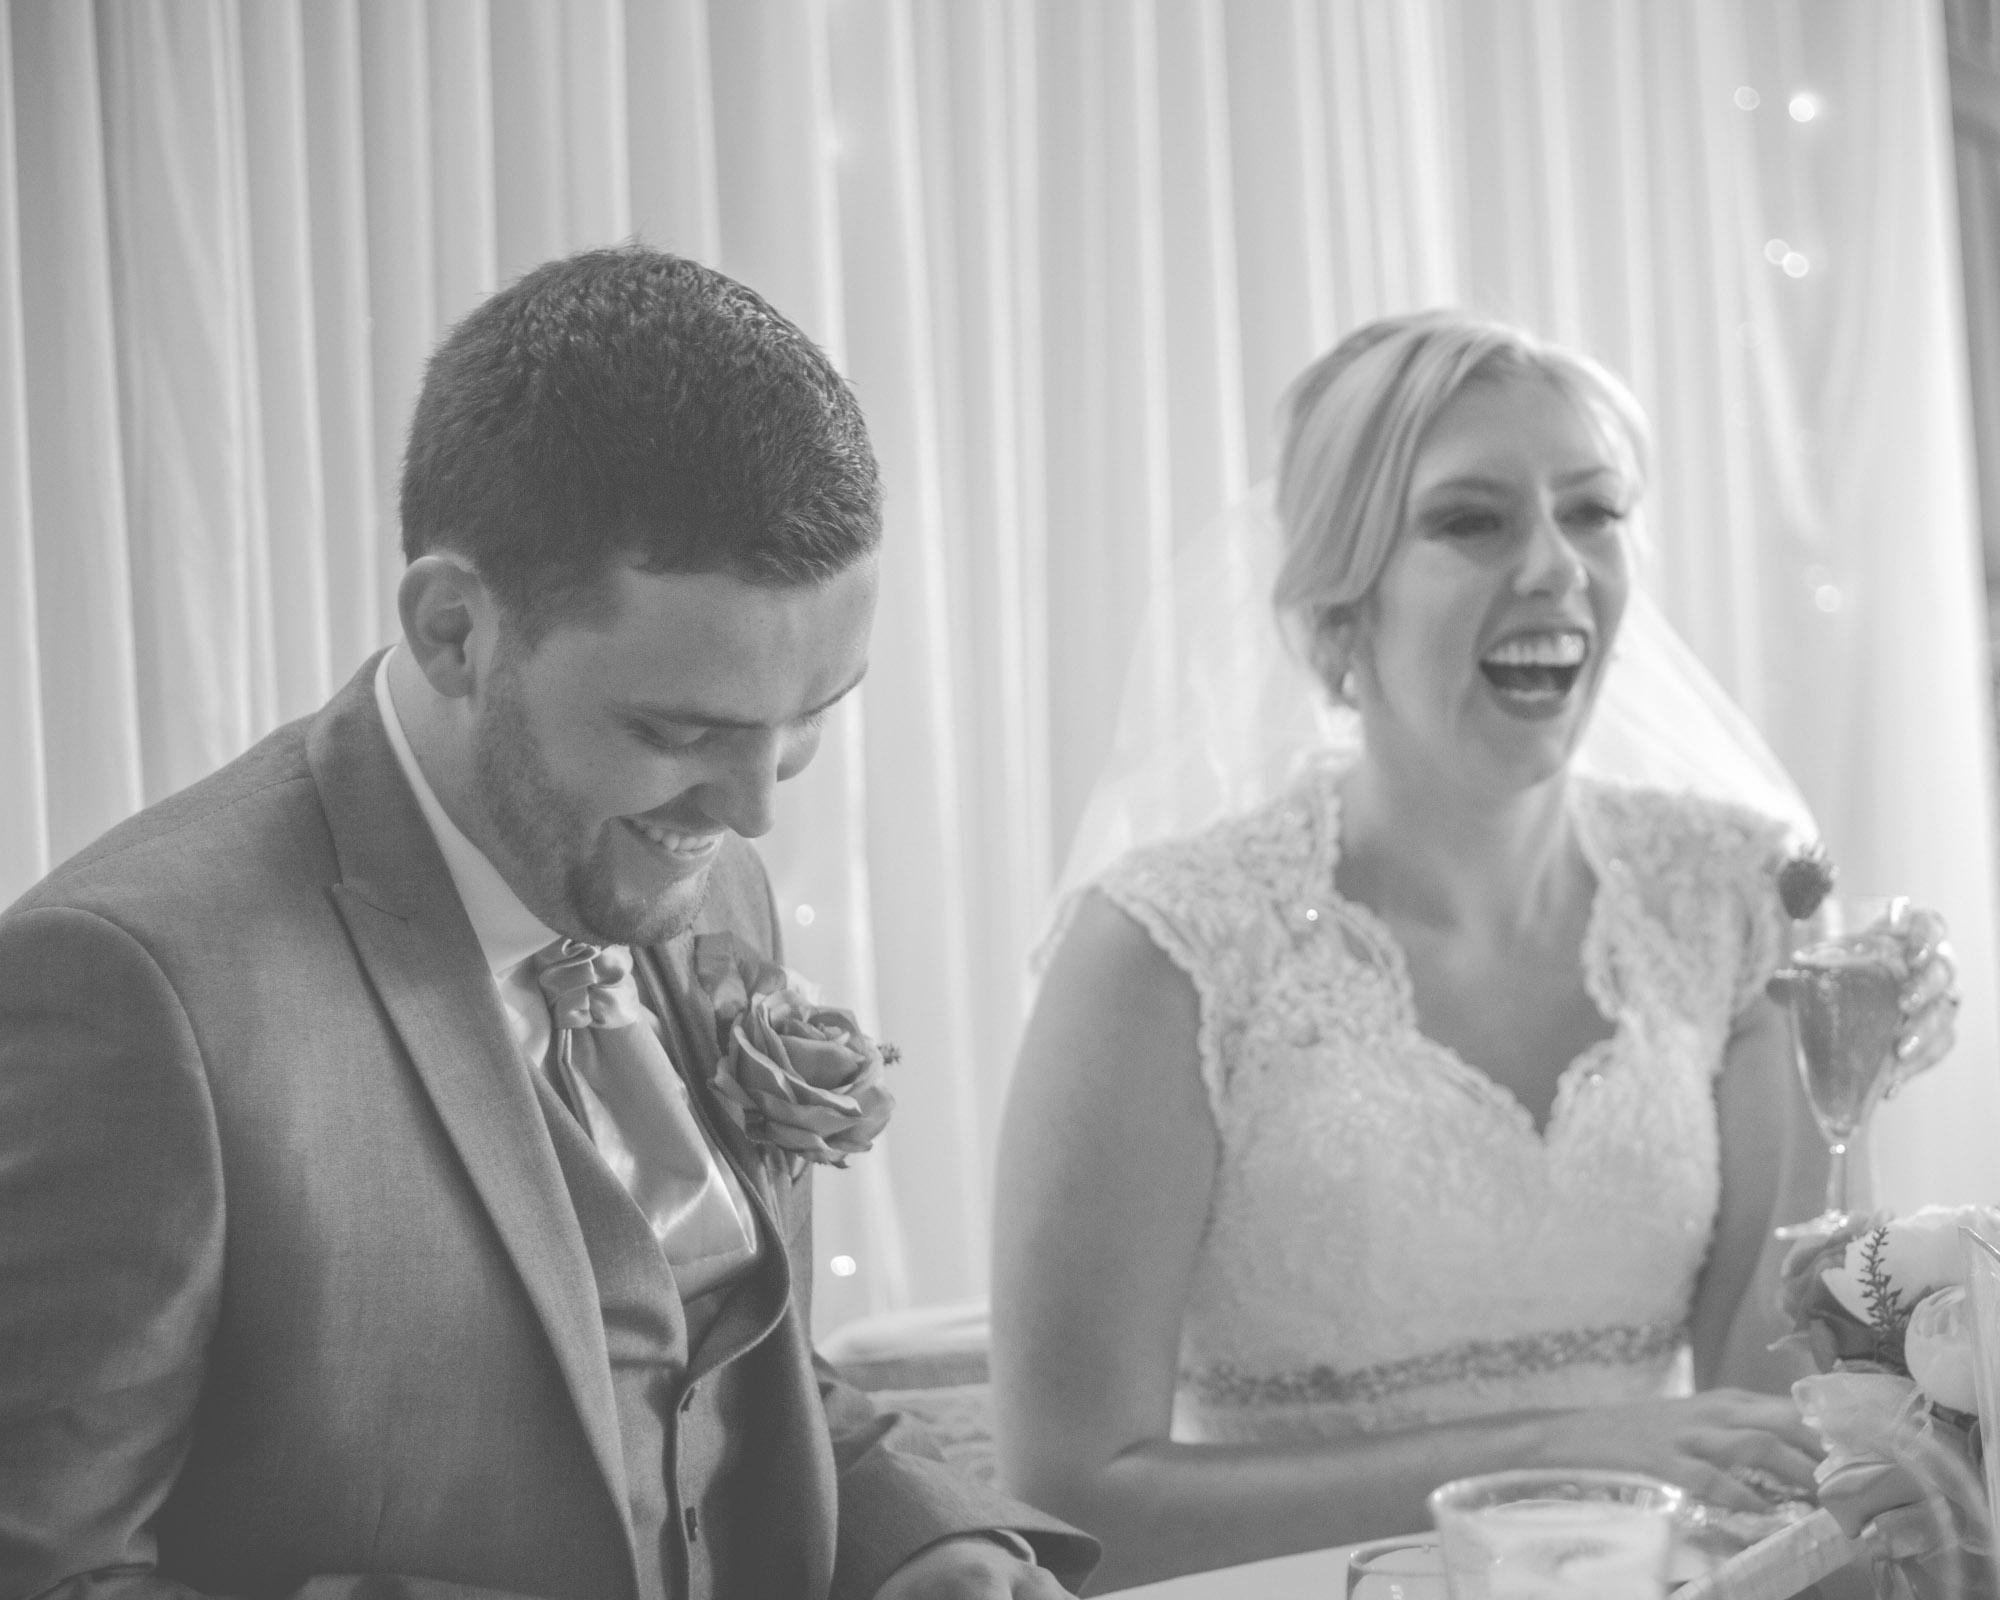 skipton-registry-office-wedding-photography-44.jpg